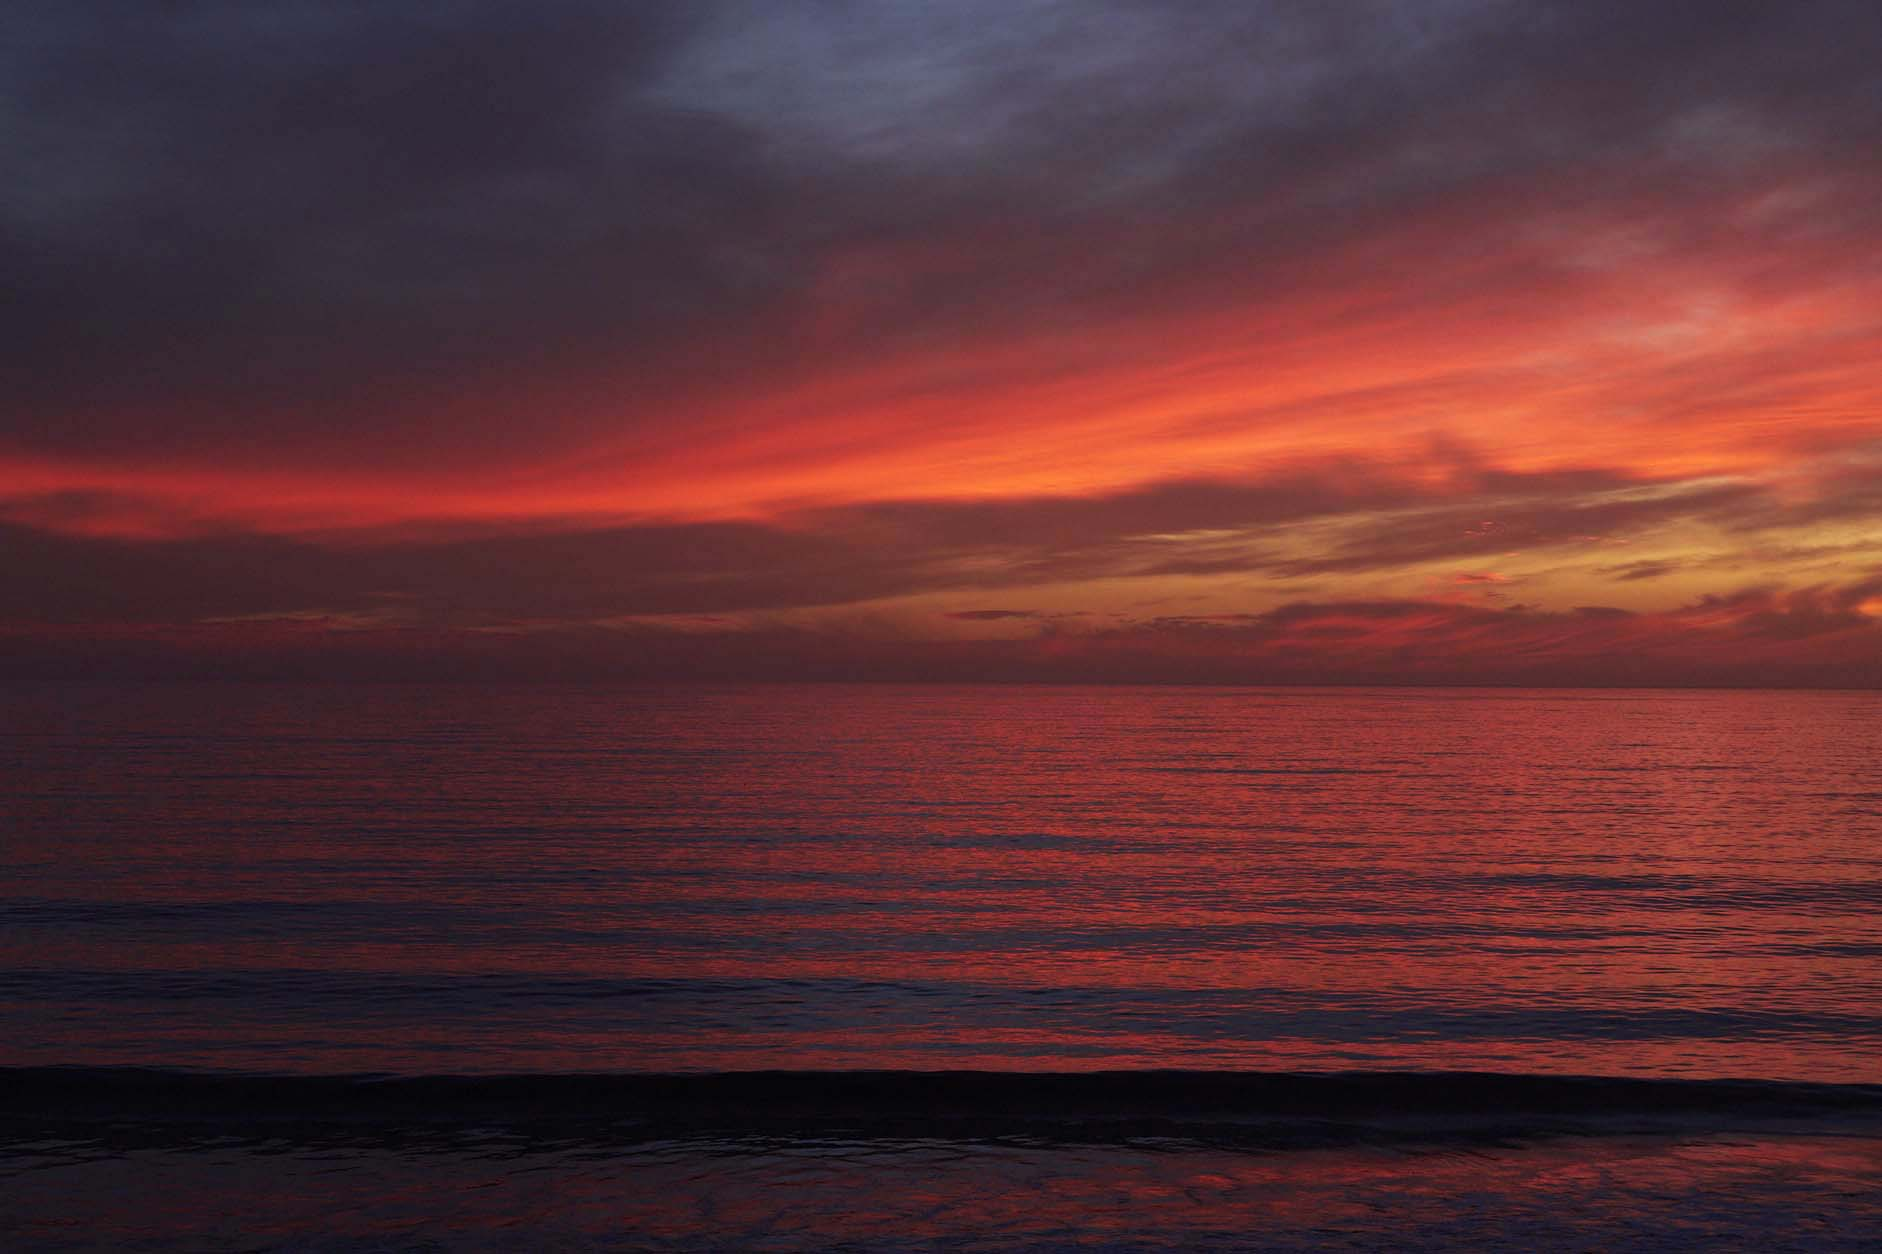 sunset_carlsbad_0715.jpg